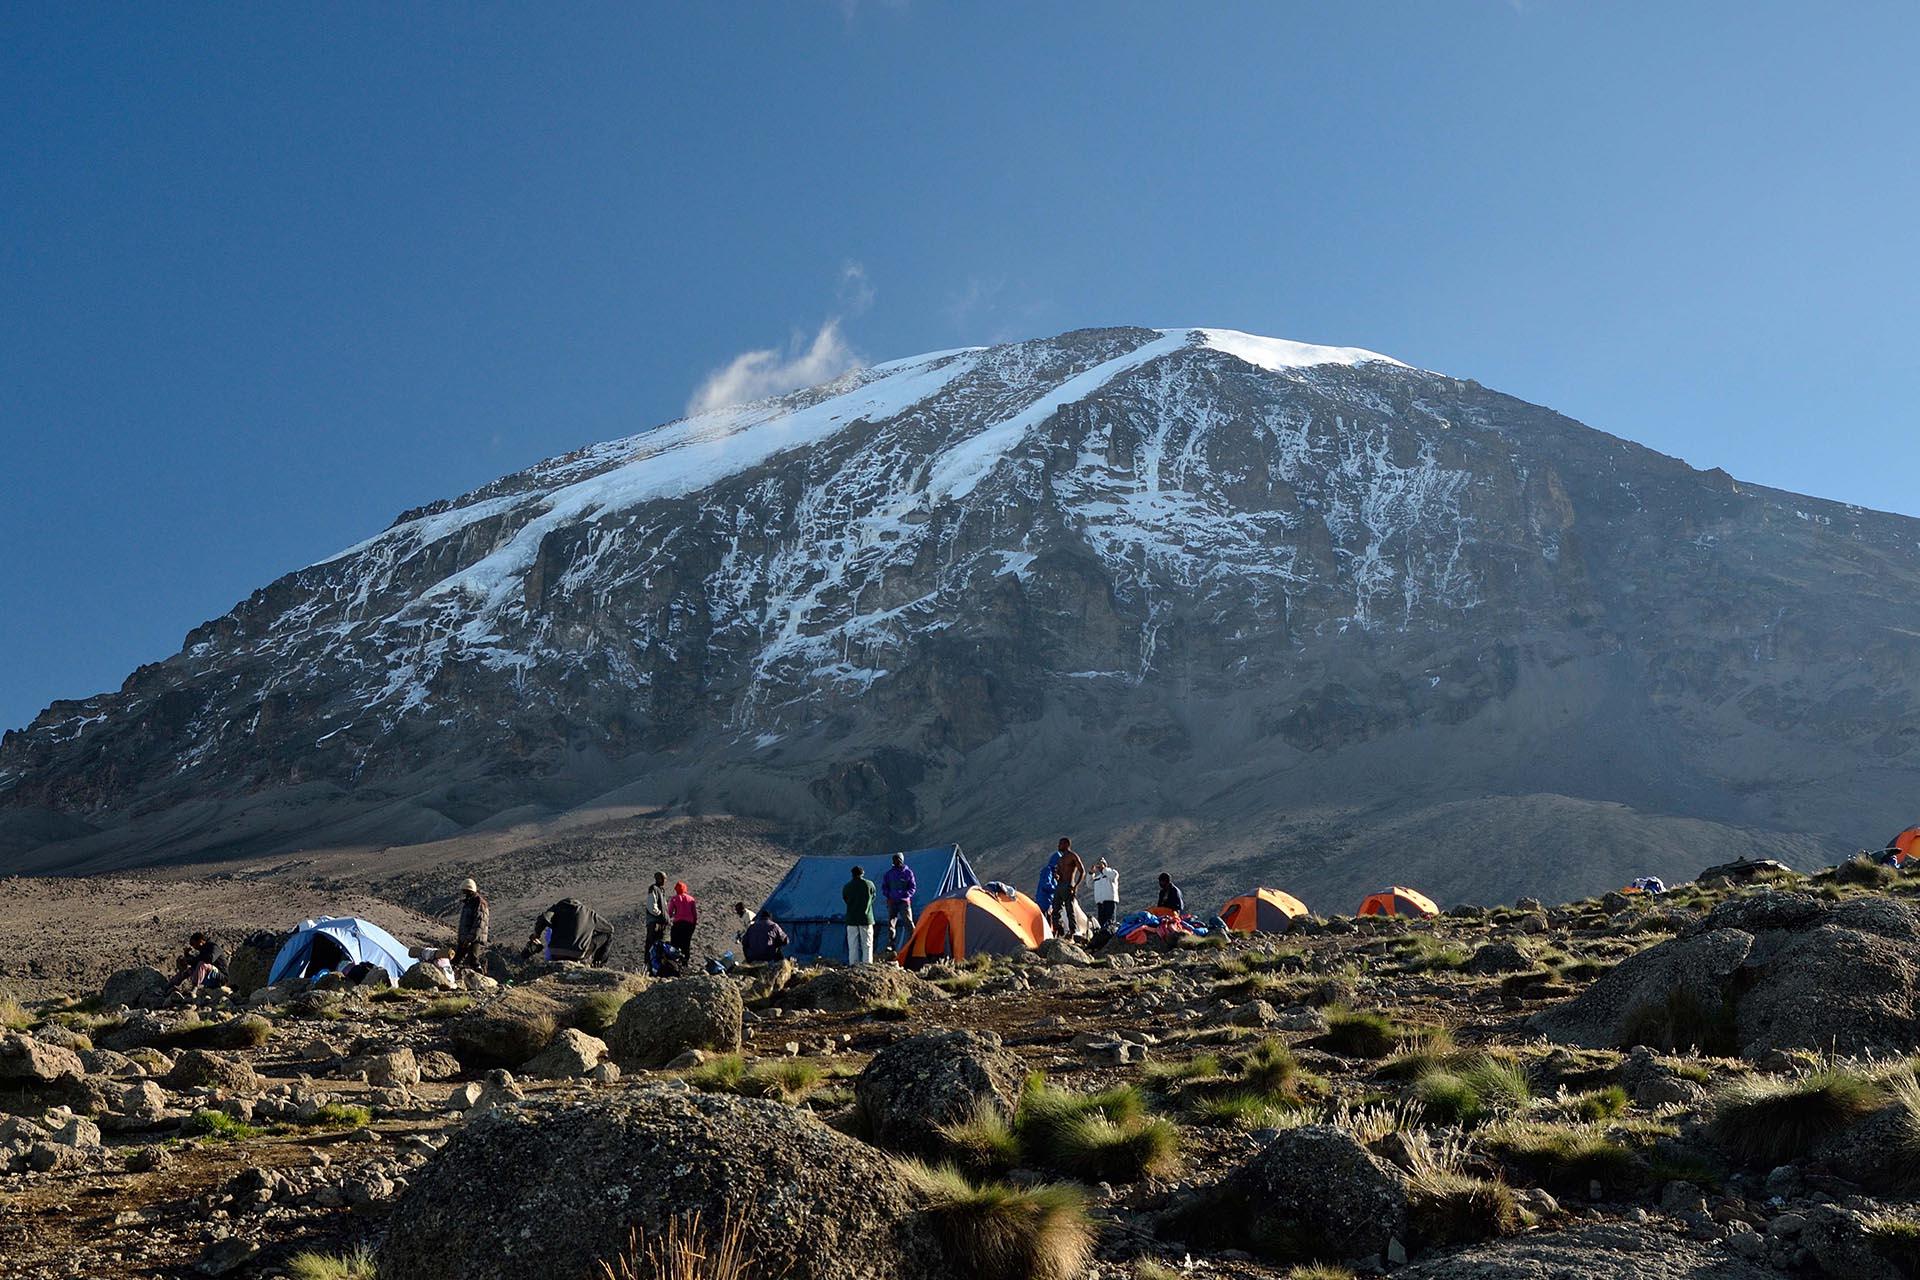 momella-route-mt-meru-trekking-itineraries-maasai-wanderings-tanzania-africa